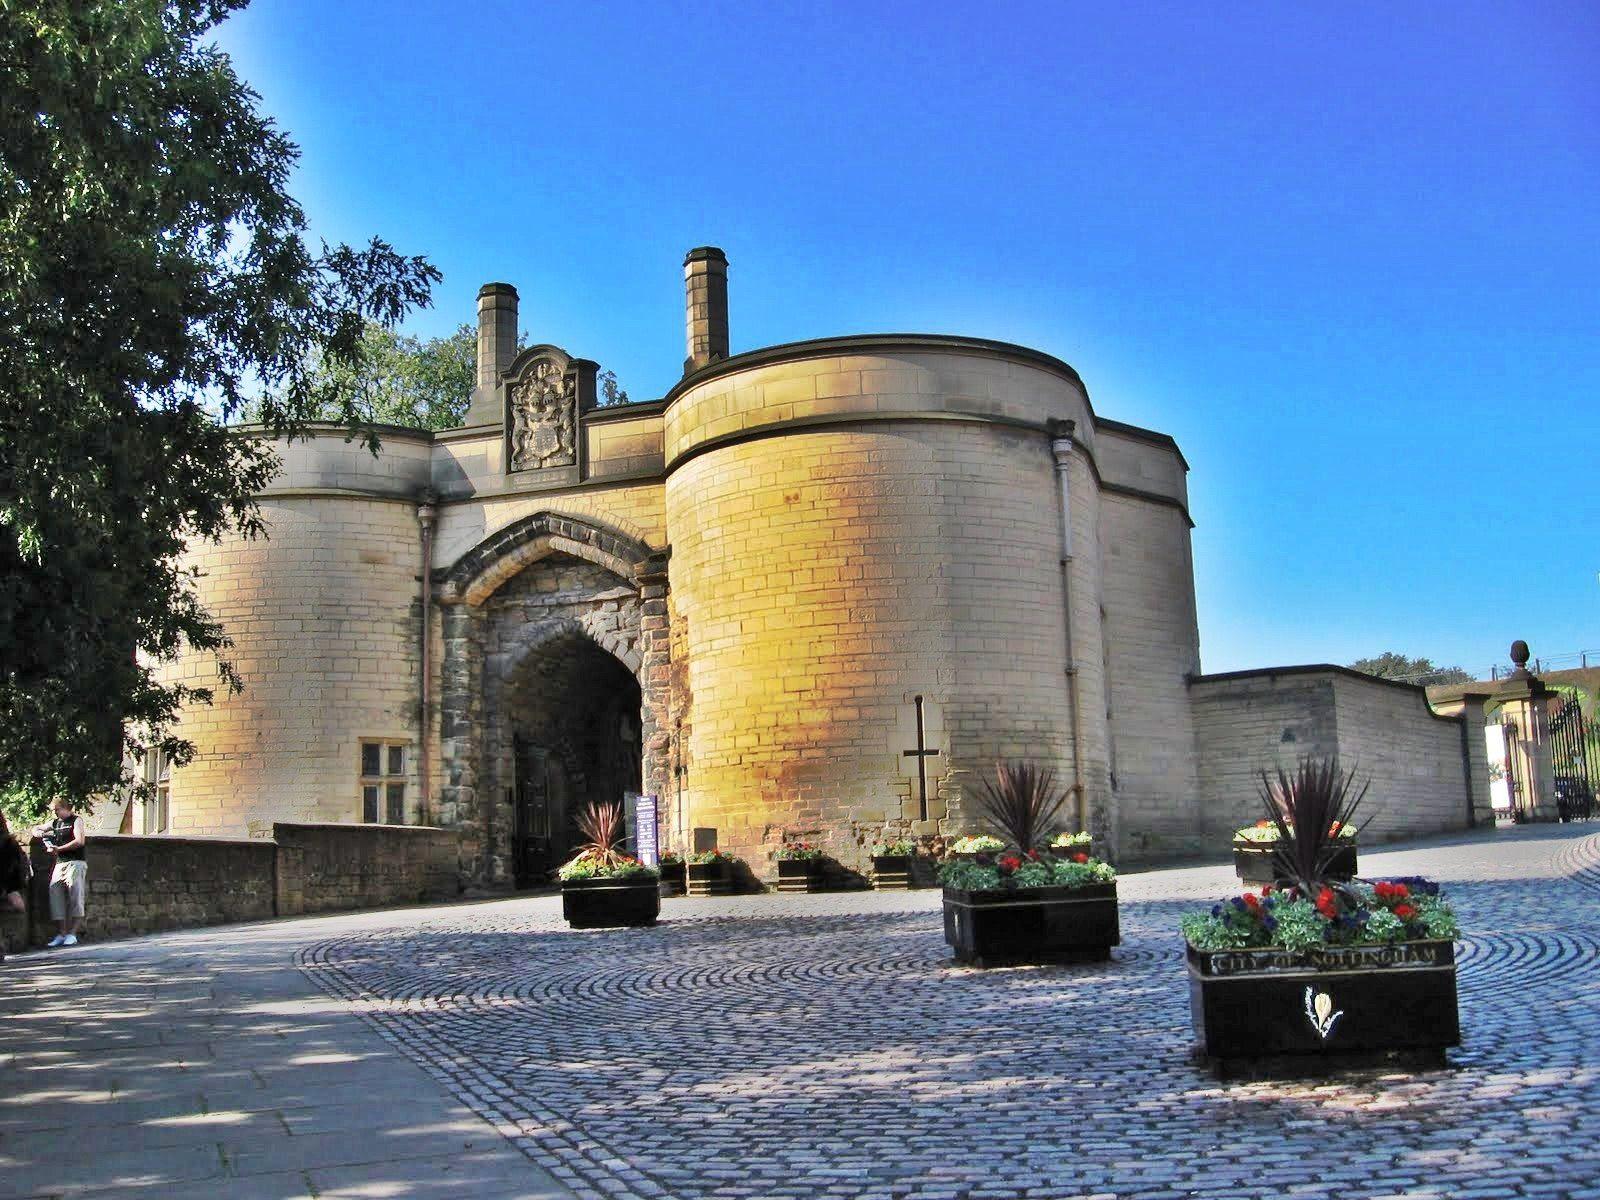 Nottingham castle | nottingham castle Nottingham, England